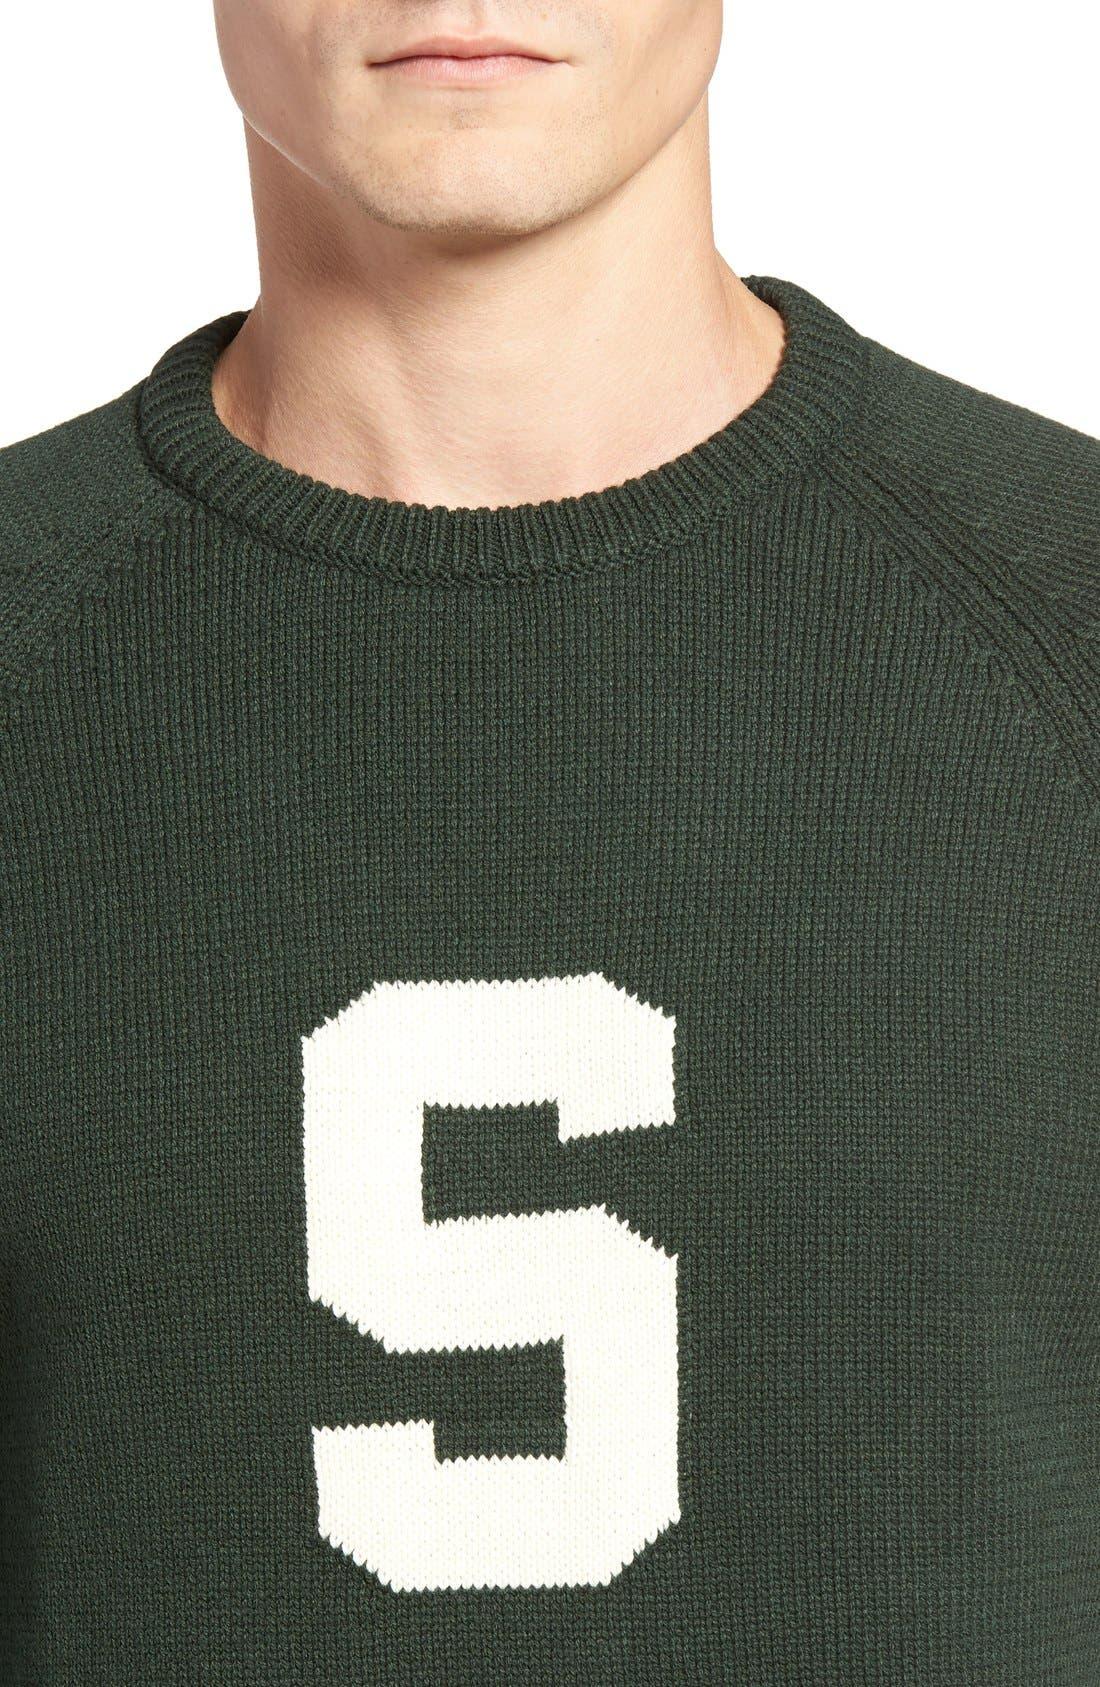 HILLFLINT,                             Michigan State Heritage Sweater,                             Alternate thumbnail 4, color,                             300